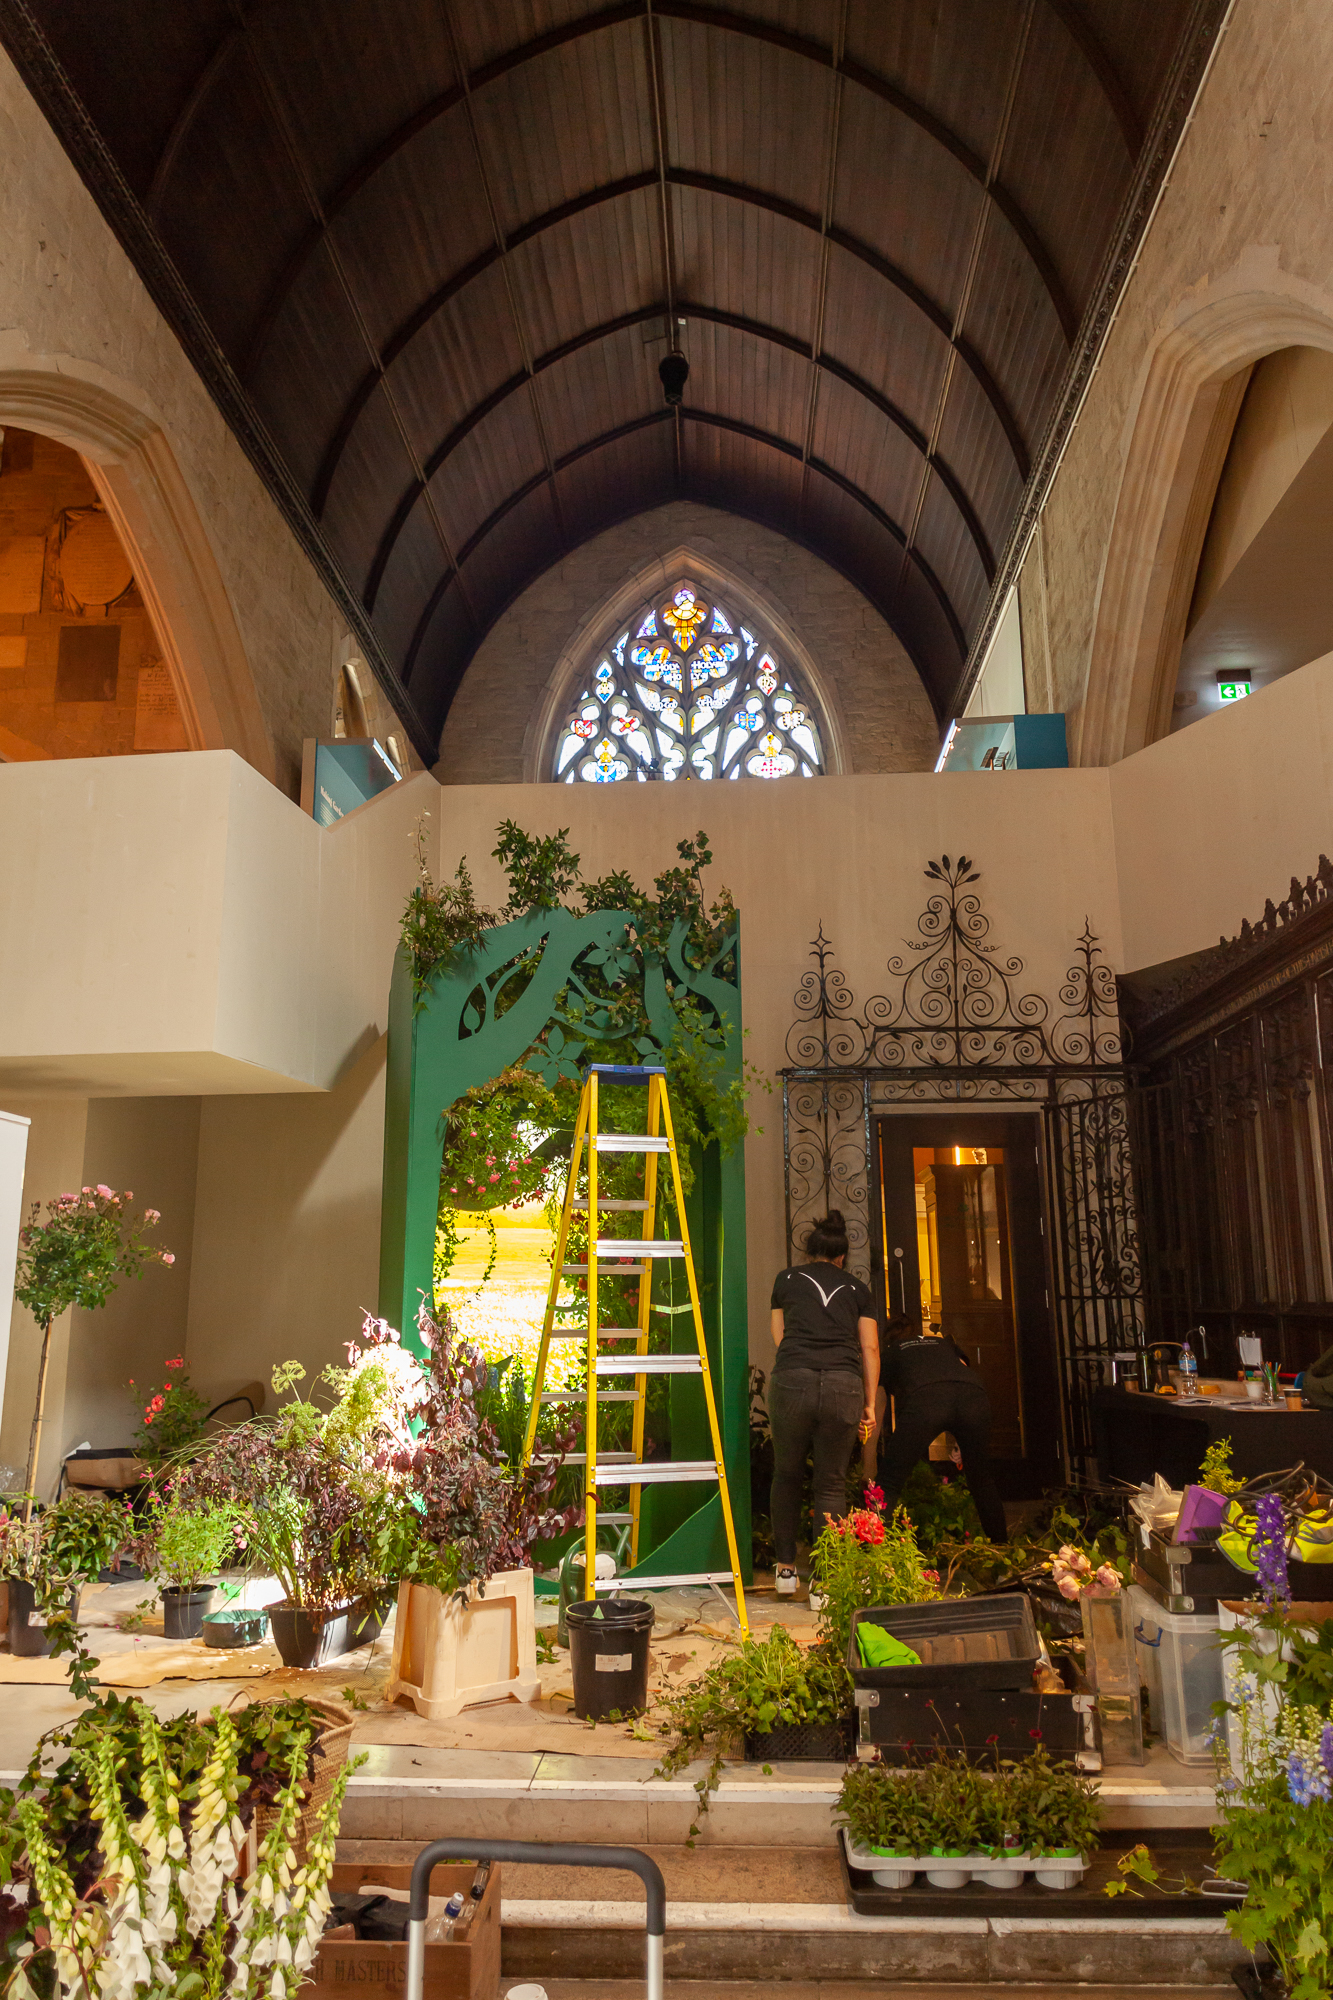 Veevers-Carter-installation-British-Flowers-Week-2018-at-Garden-Museum-by-New-Covent-Garden-Market (3).jpg